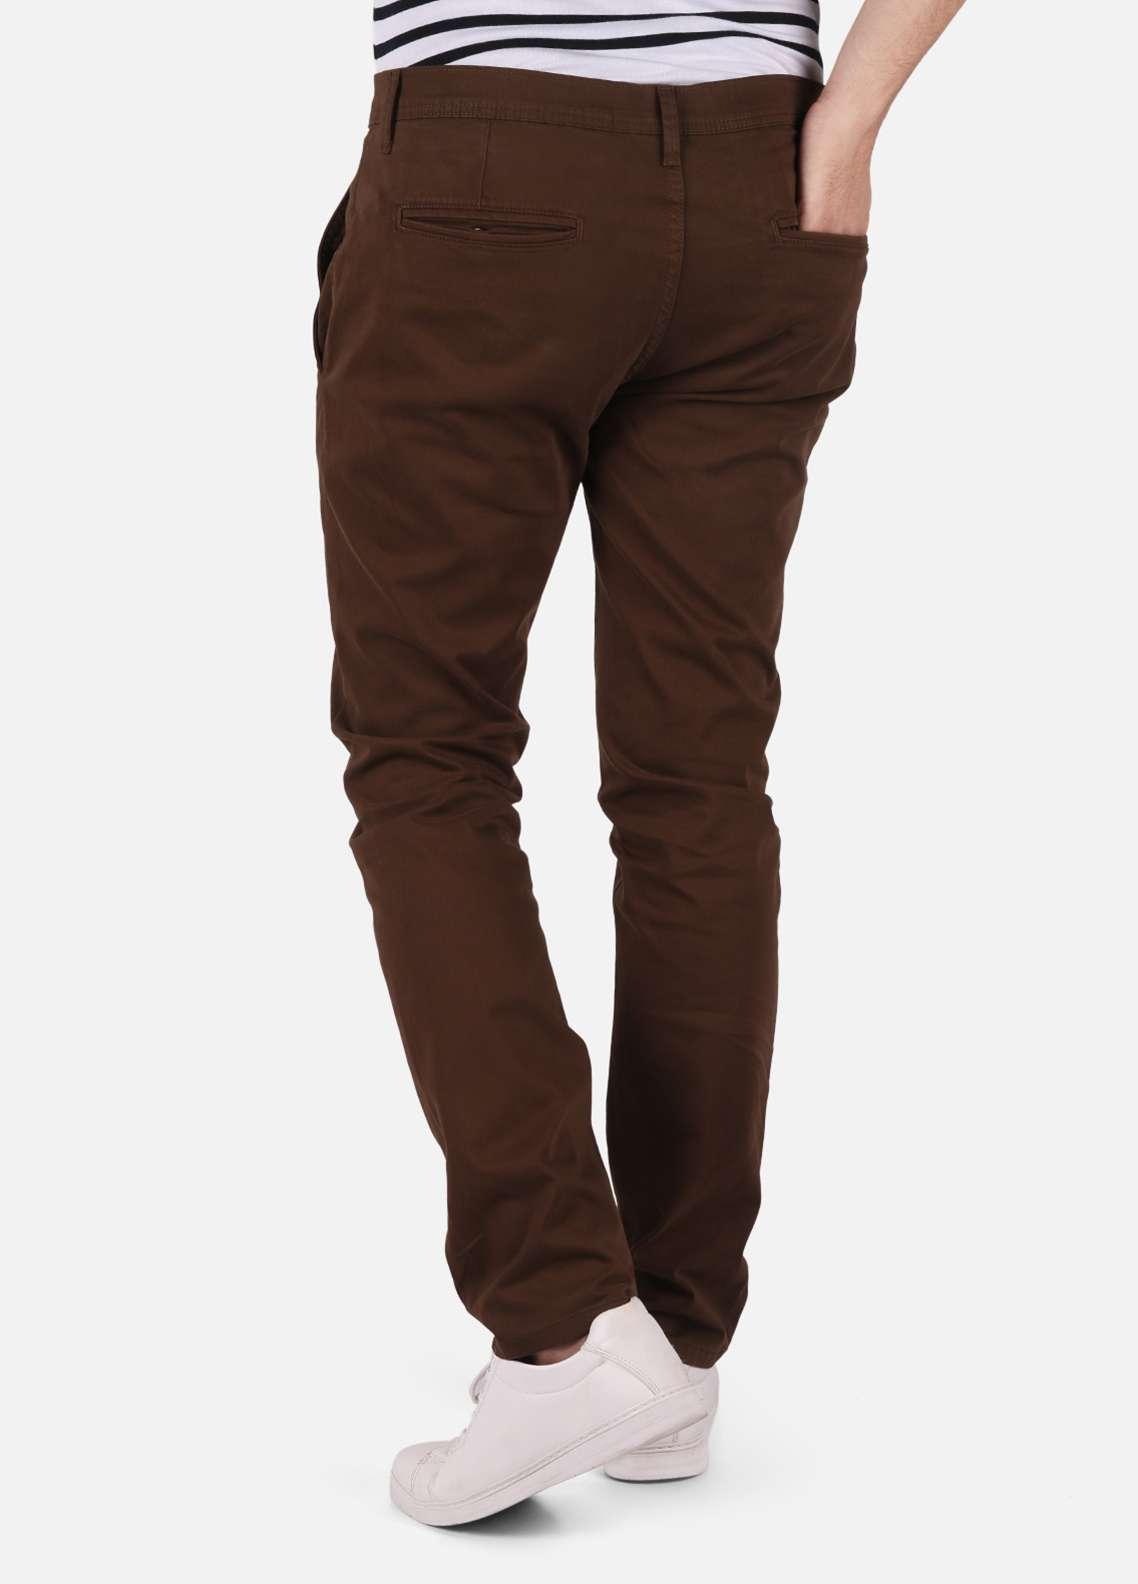 Furor  Chino Pants for Men - Brown FRM18C FMBCP18-012